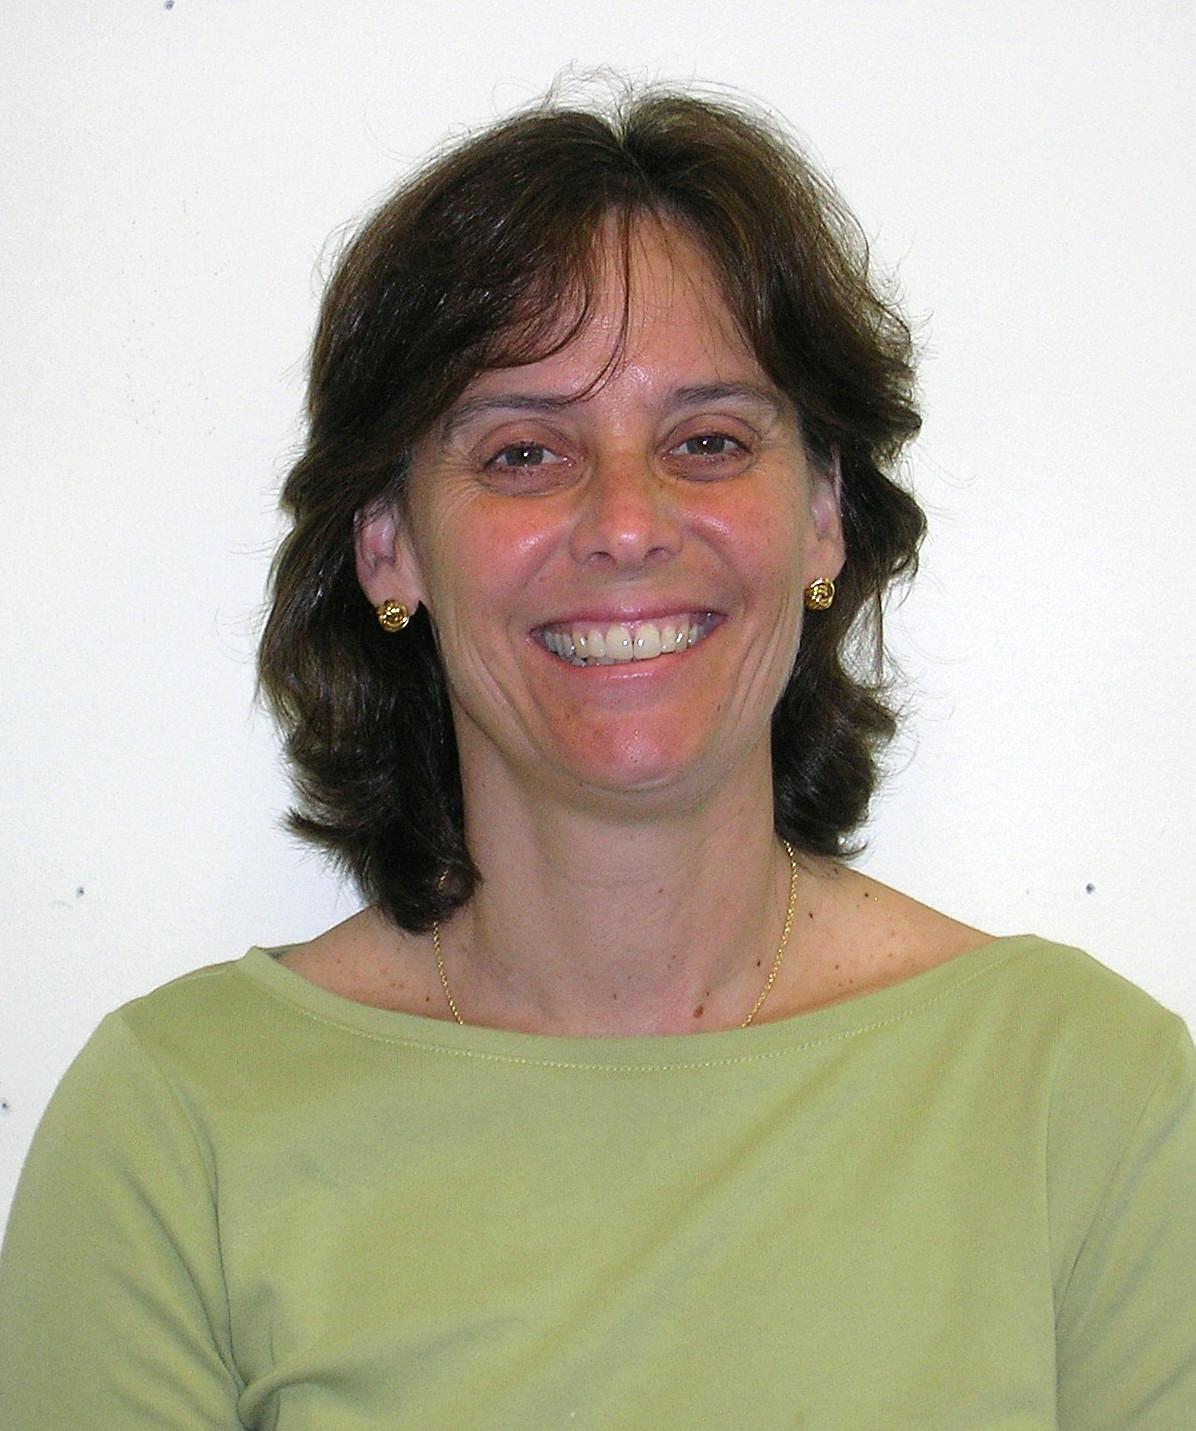 Lisa Cramer